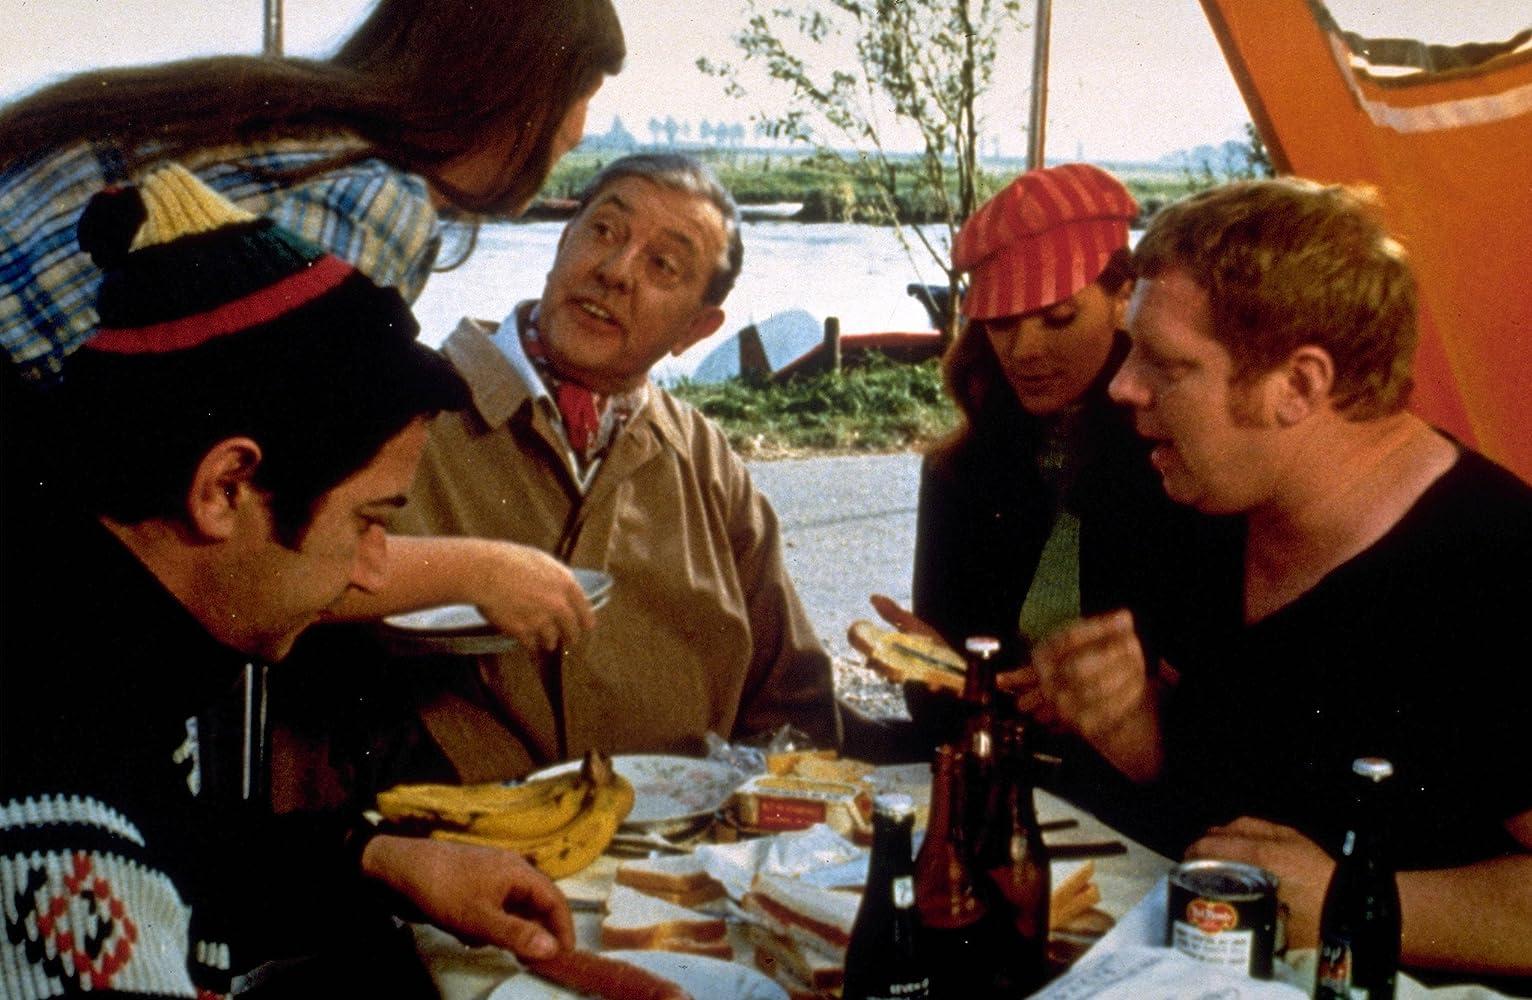 Laura Innes,Rupert Graves (born 1963) Adult clip Sharon Shore,Iris Hoey